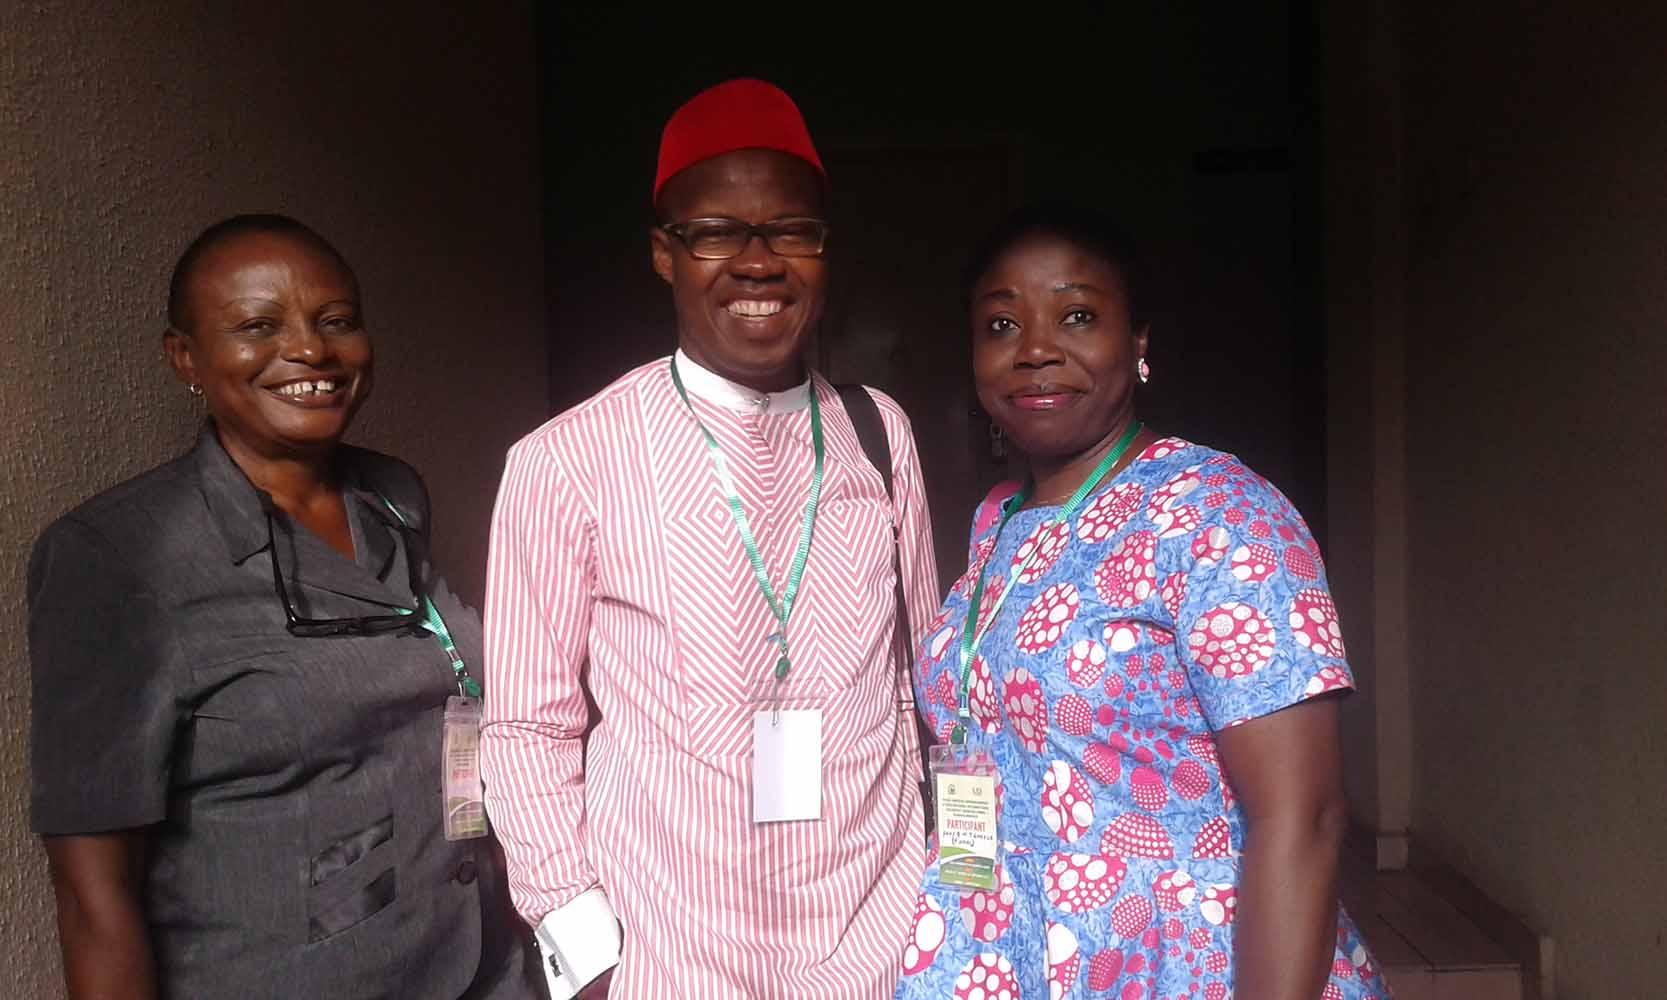 Professors in the AE-FUNAI's contingent – Left to Right : Prof Chinyere NNorom, Prof Jonny Ogunji and Prof G.M.T Emezue